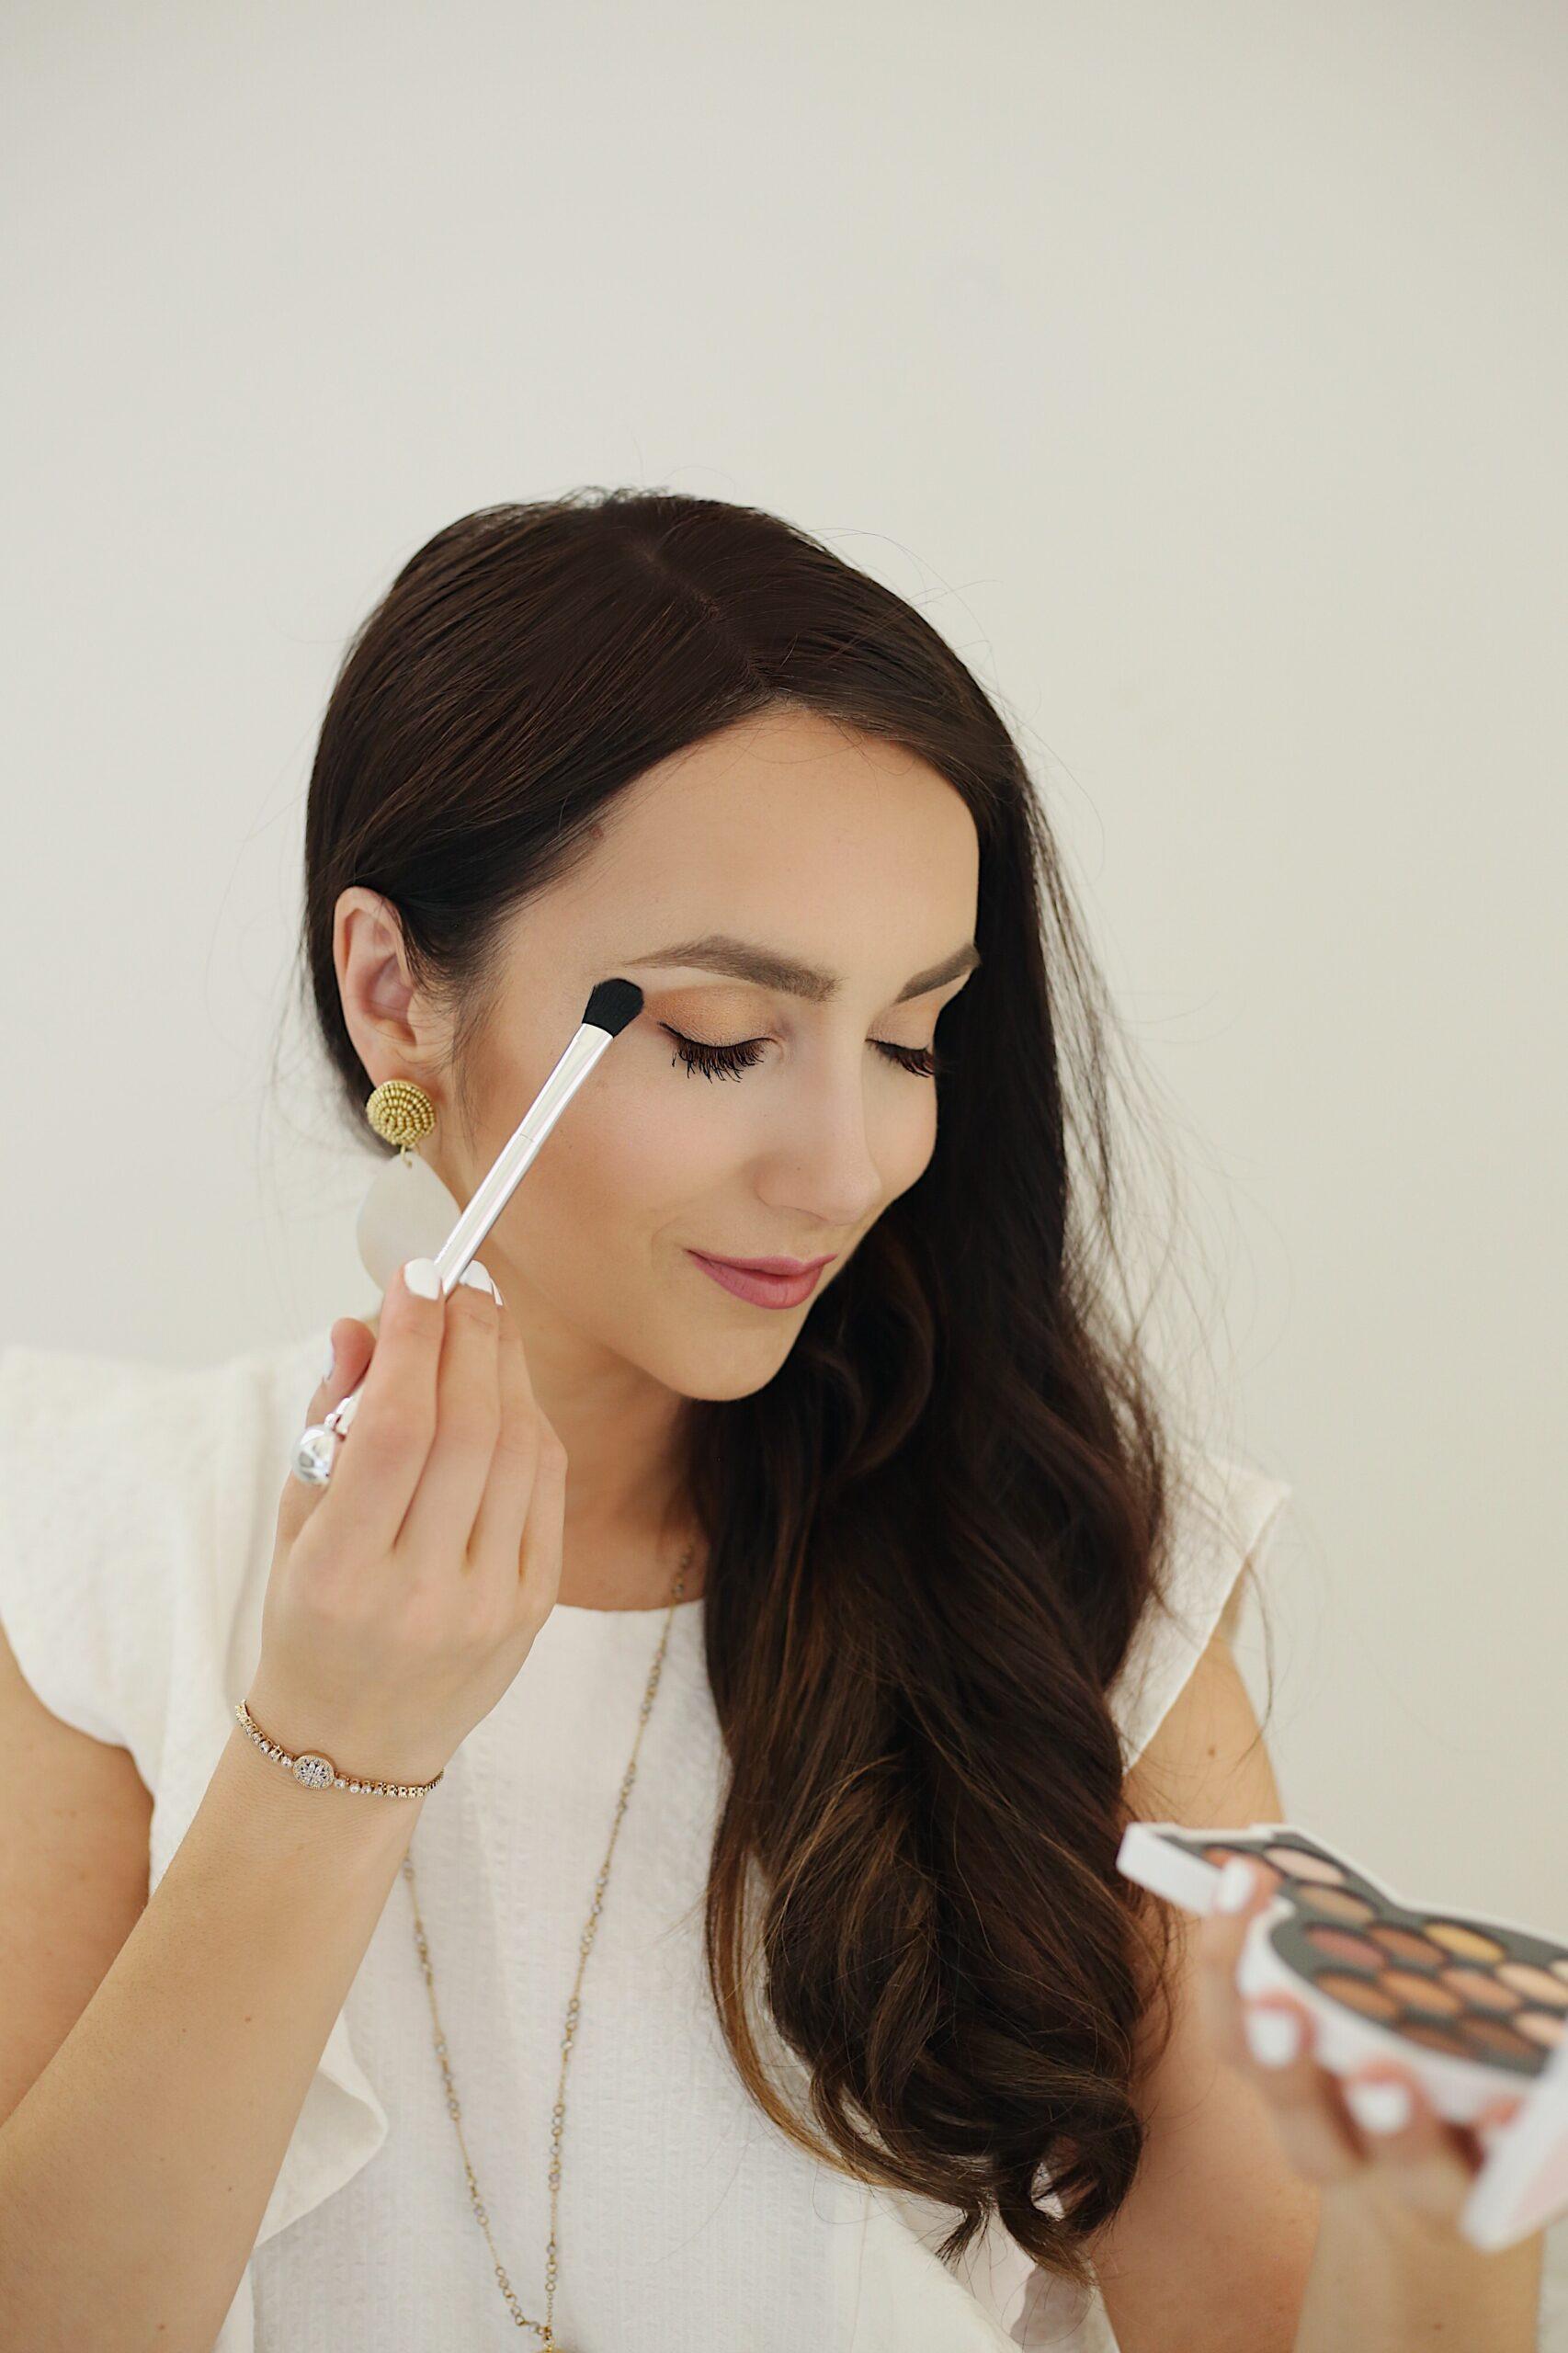 summer glow makeup tutorial, summer eyeshadows, easy summer makeup,